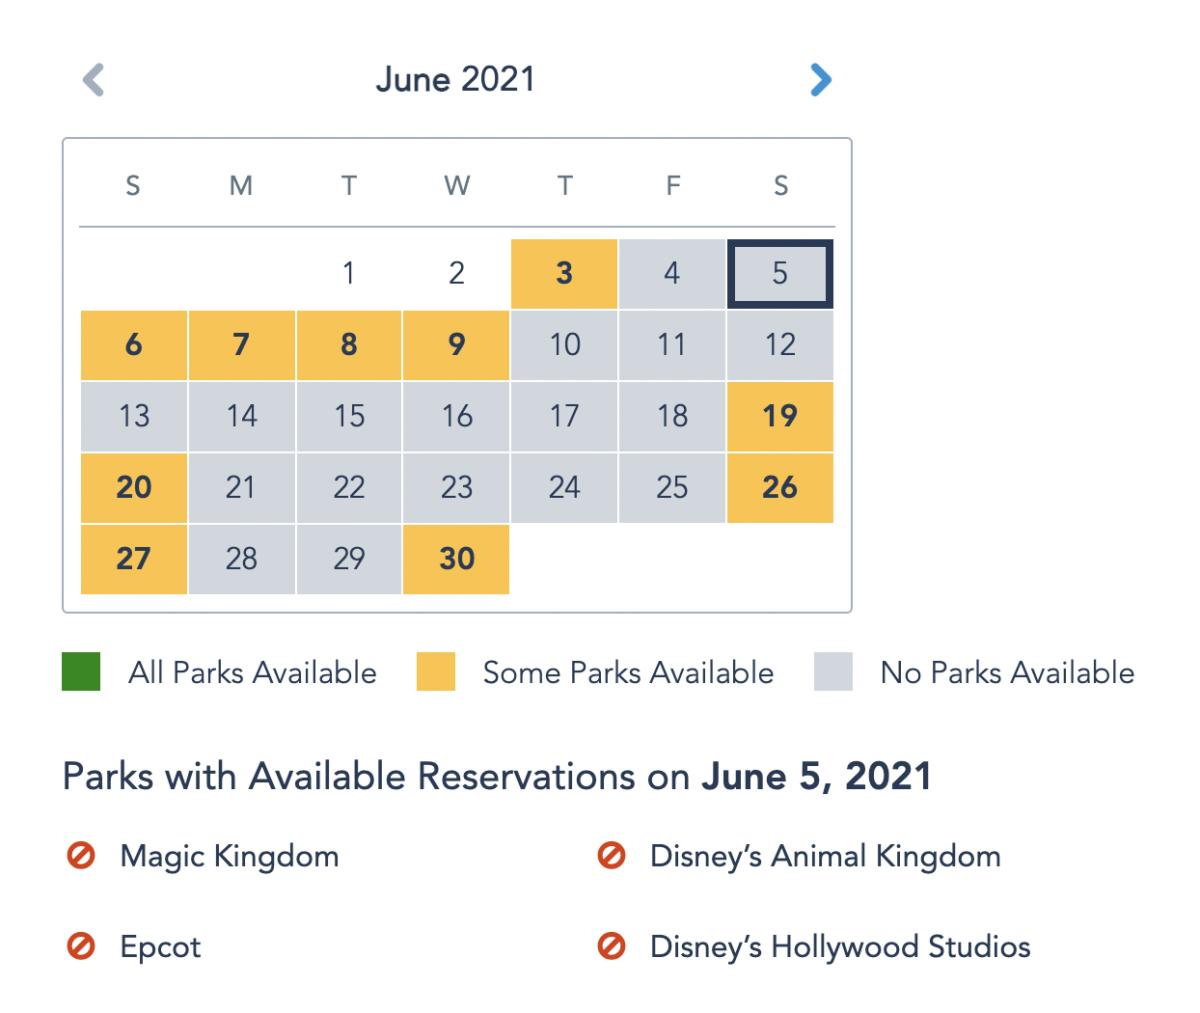 Park Reservation Availability June